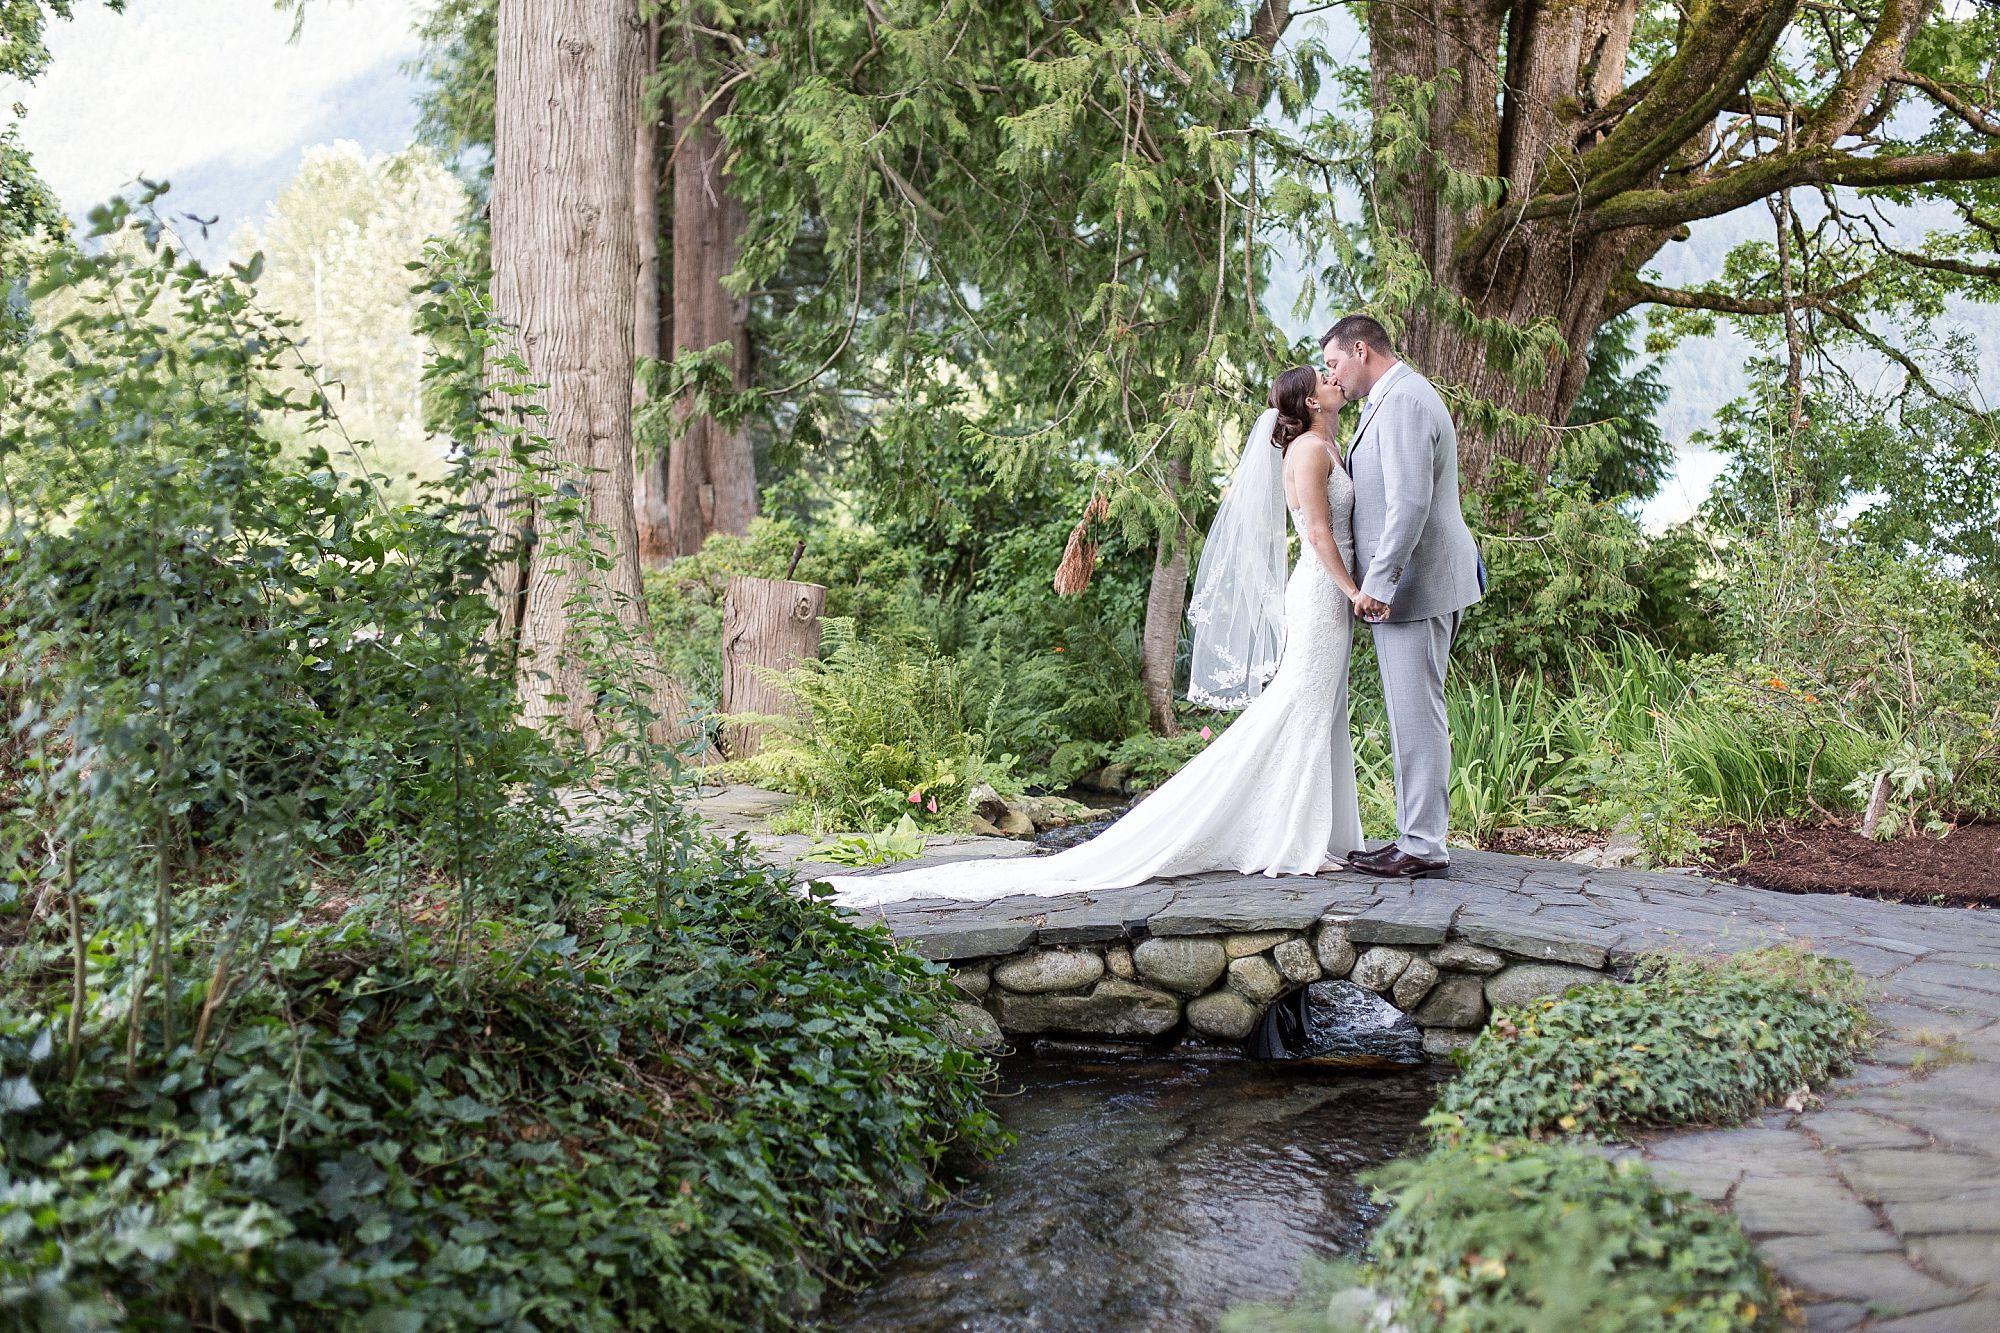 Vancouver Wedding Photography Hayley Rae Photography Associate_0010.jpg